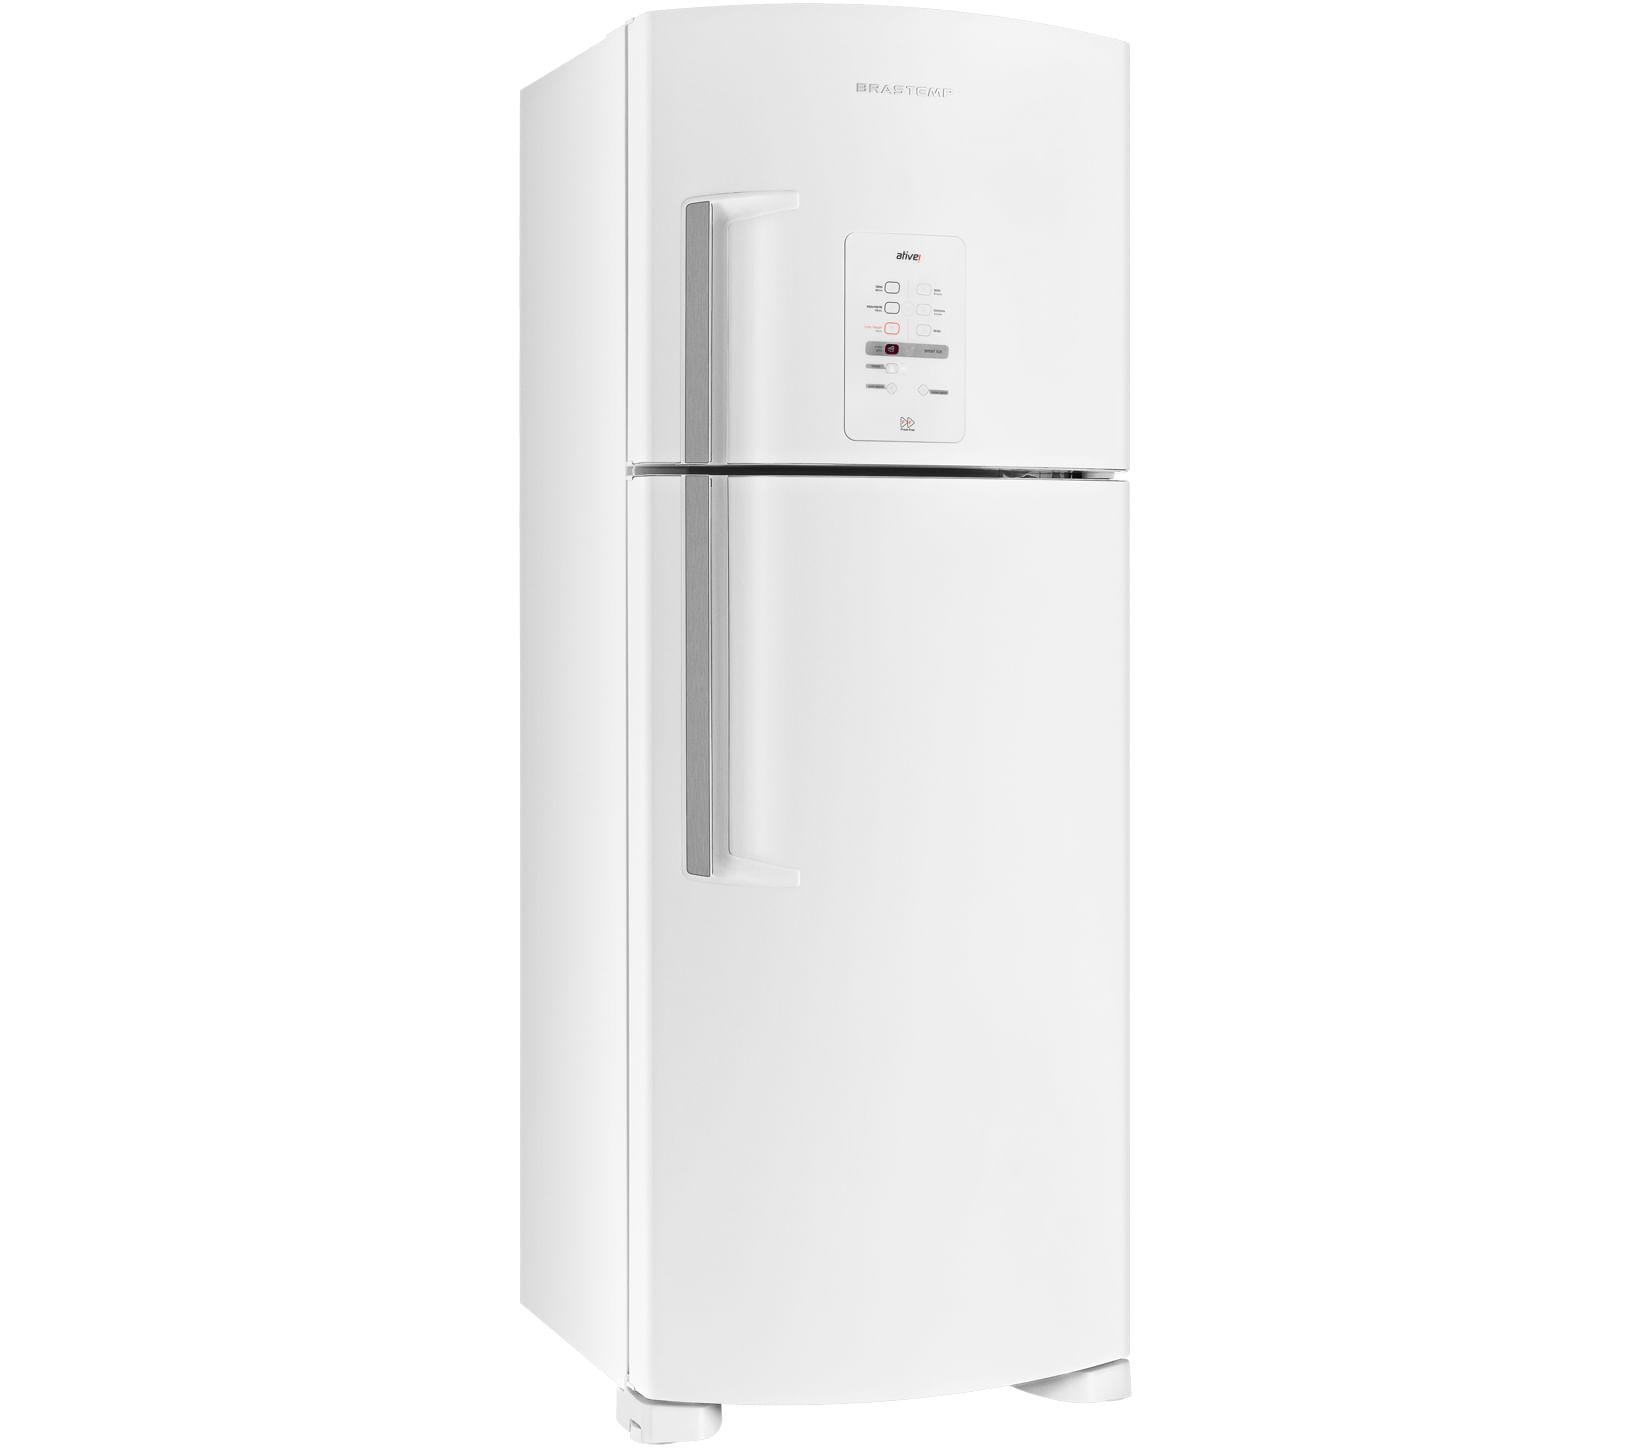 Geladeira Brastemp Frost Free Duplex 429 litros Branca com Smart Bar